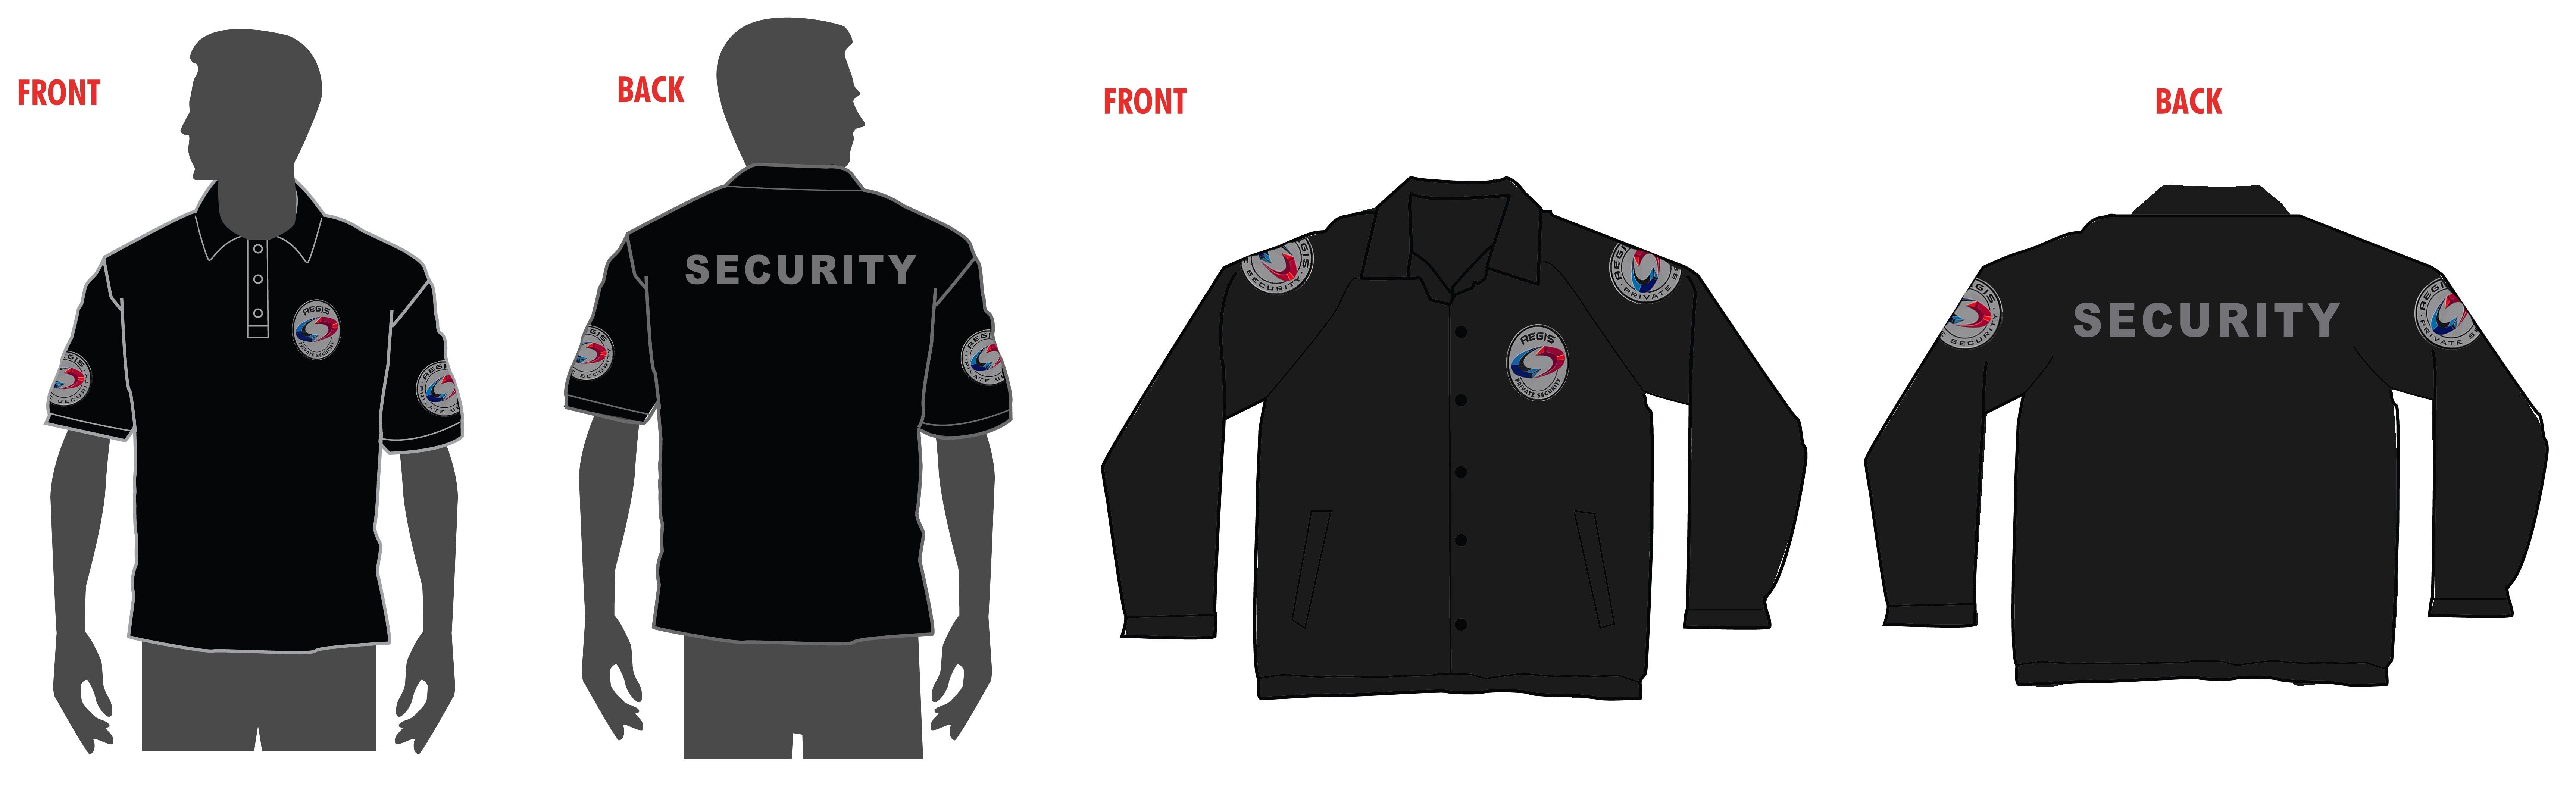 Black t shirt security - Security Uniform